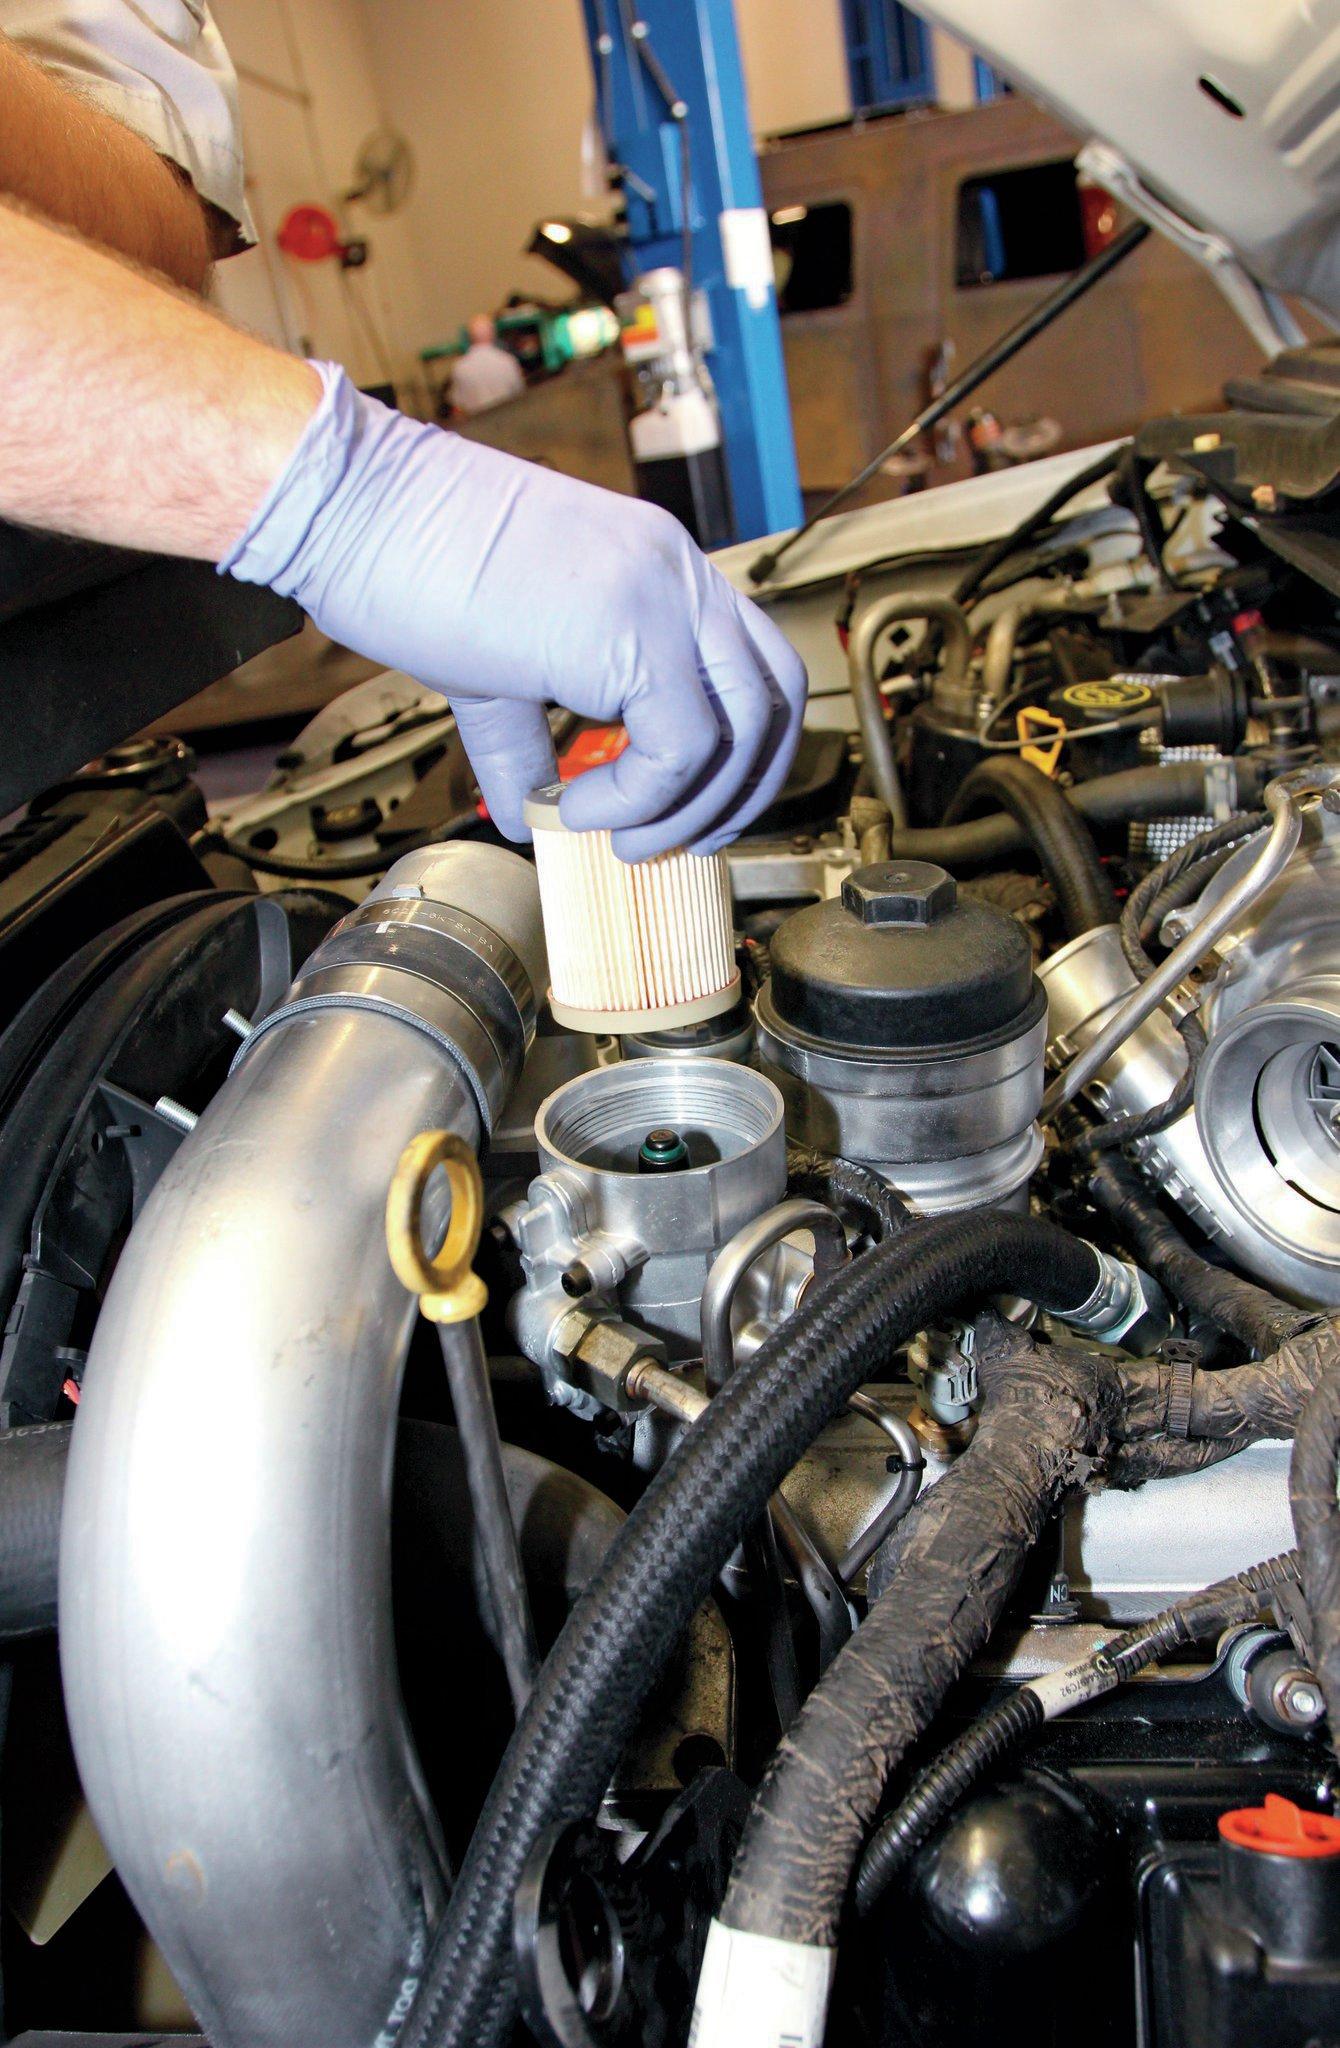 6 7 powerstroke fuel filter location 2019 chevy duramax fuel fuel filter drain plug 6 0 fuel filter location #13